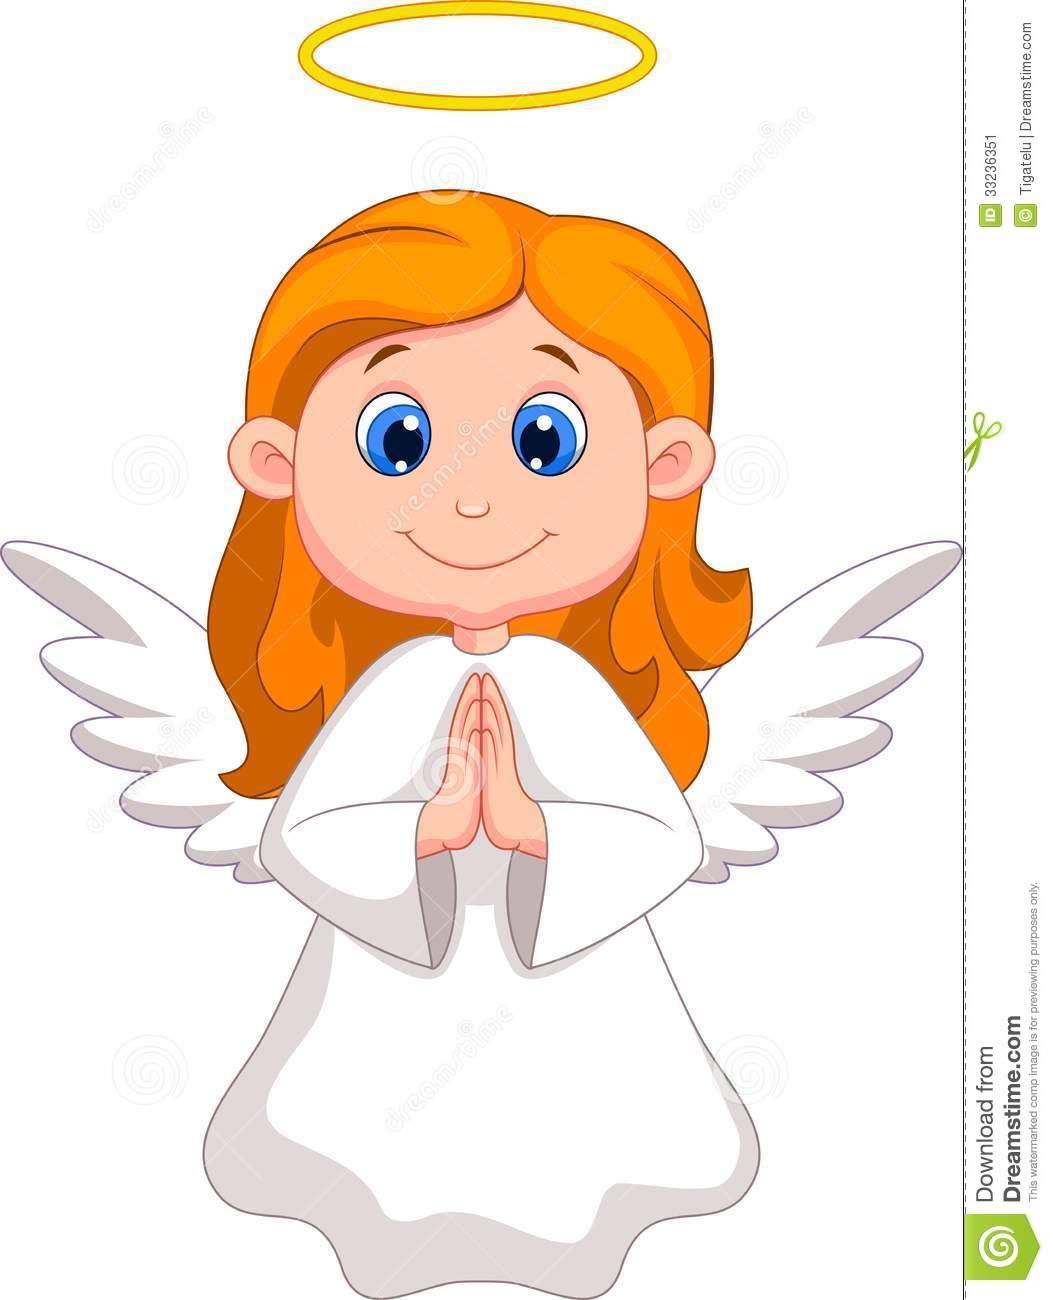 Angel cartoon christmas clipart svg Angel Cartoon Image Group with 88+ items svg